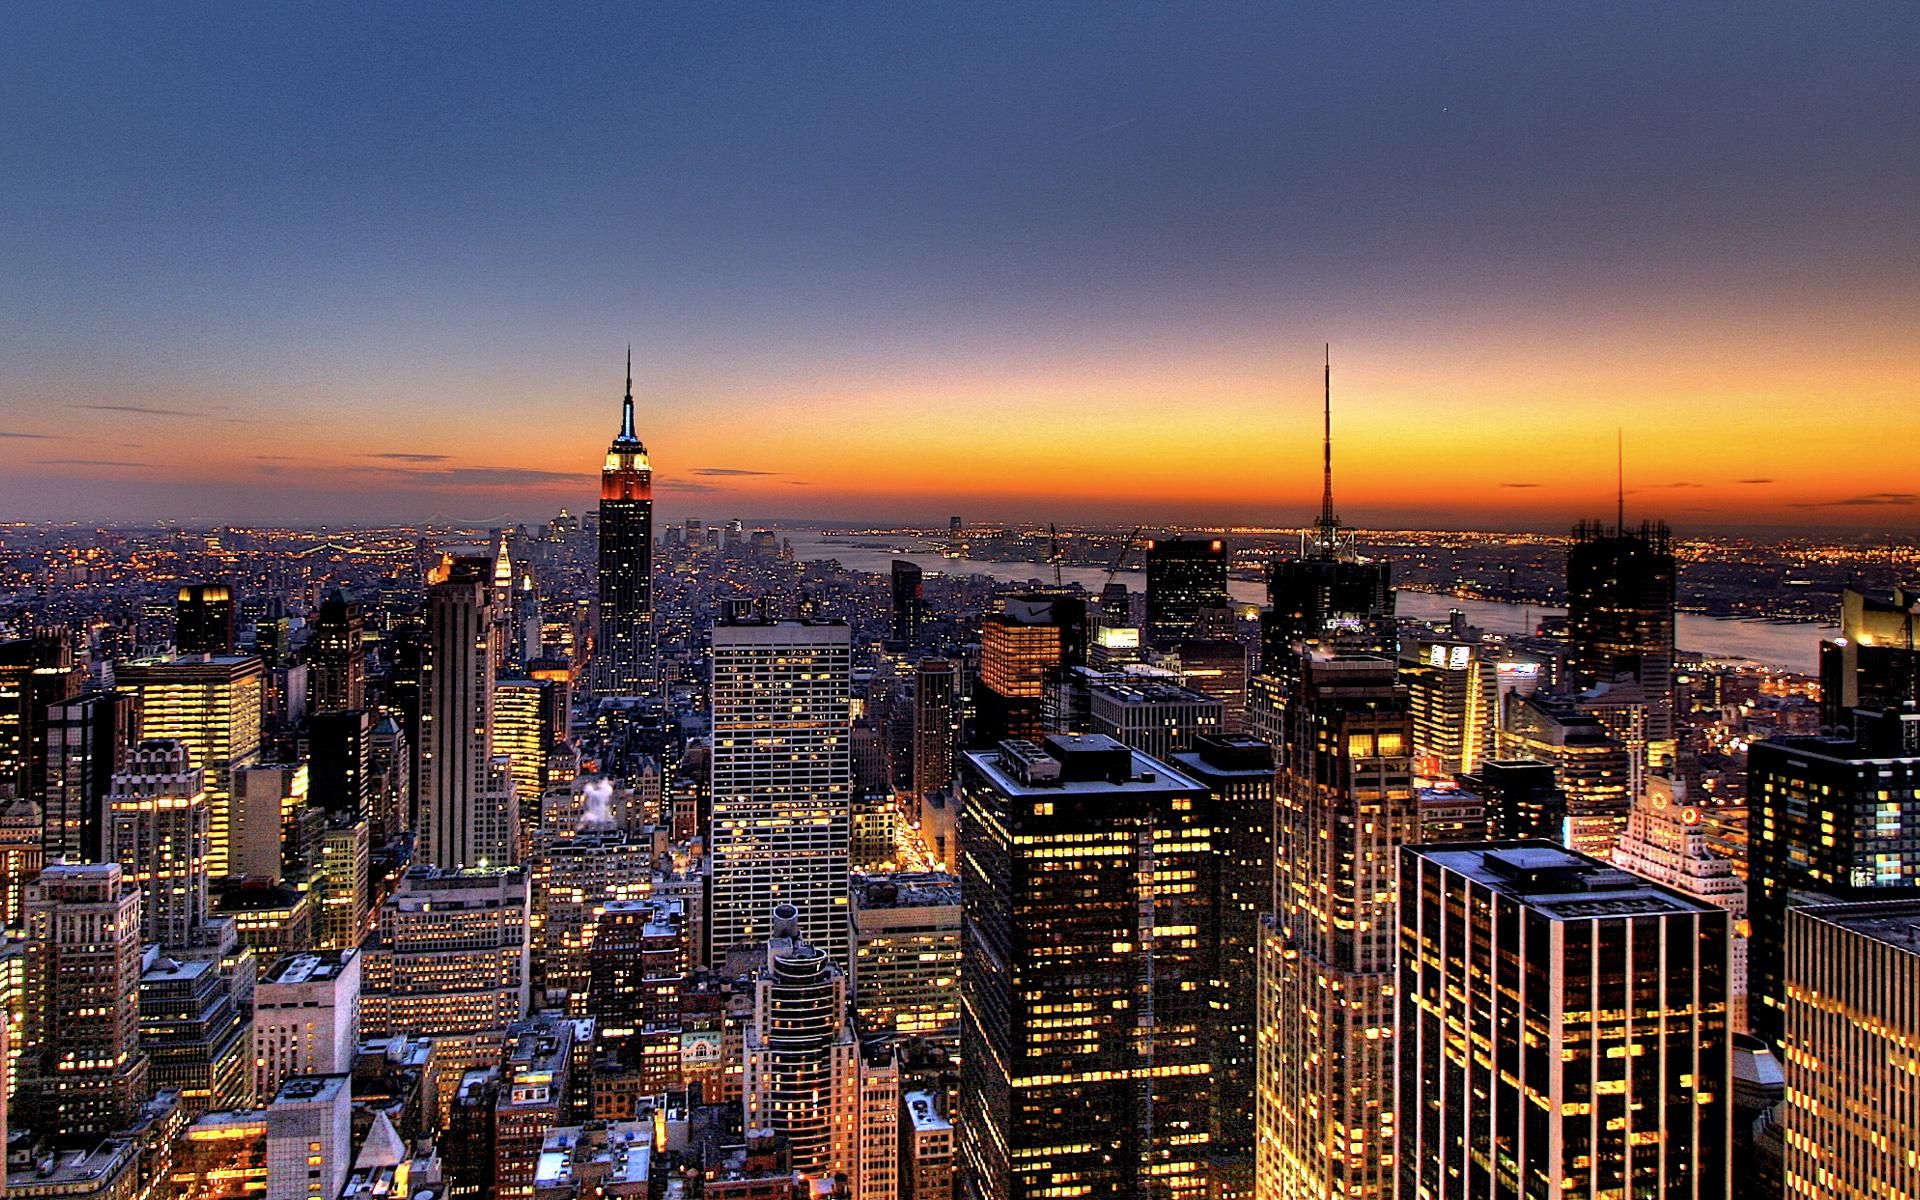 New York Skyline Wallpapers HD Wallpapers 1920x1200